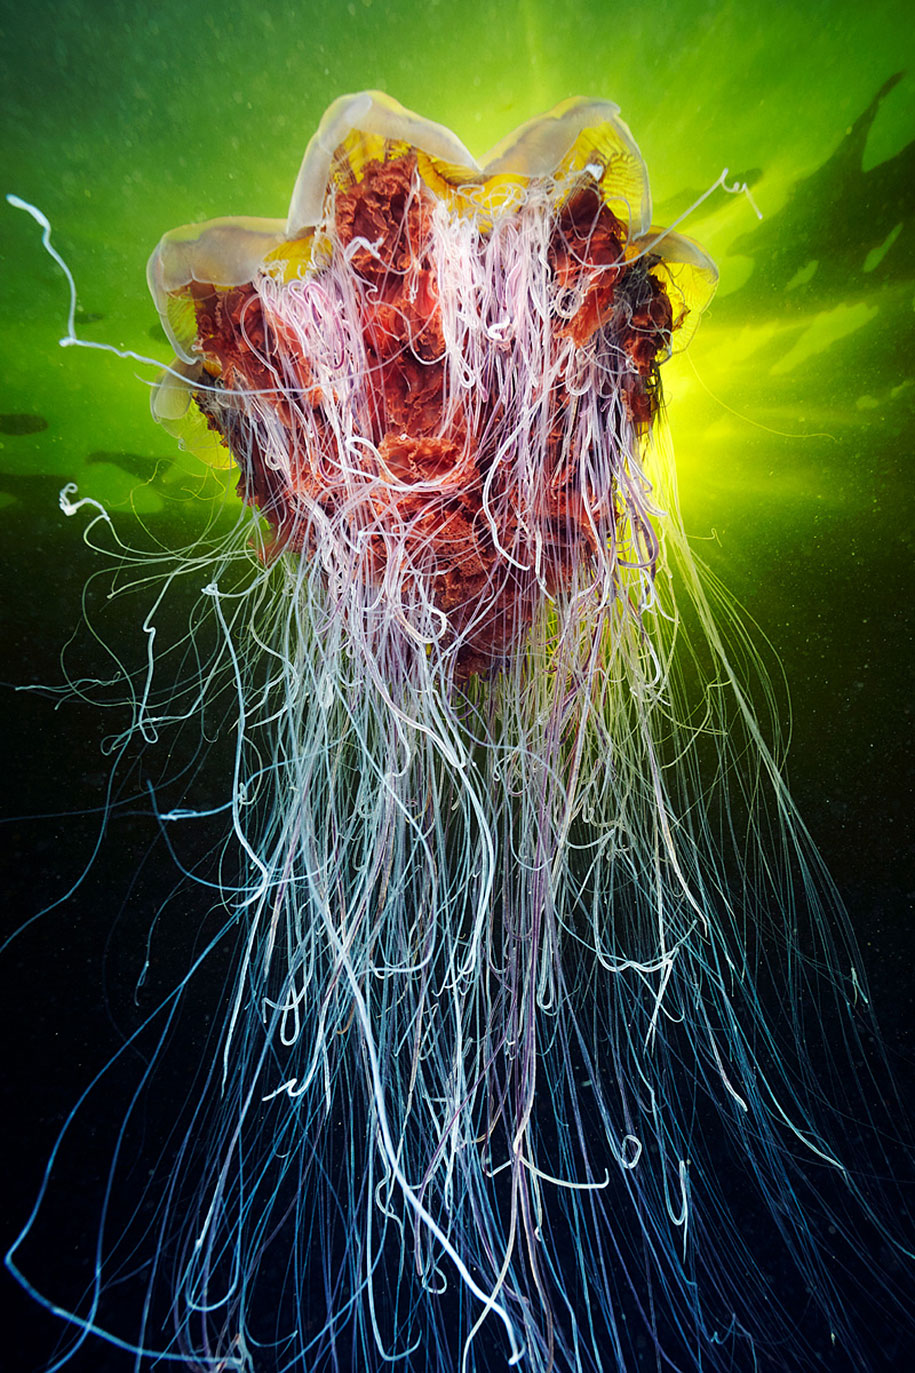 Underwater Jellyfish Photography Mesmerizing Jel...